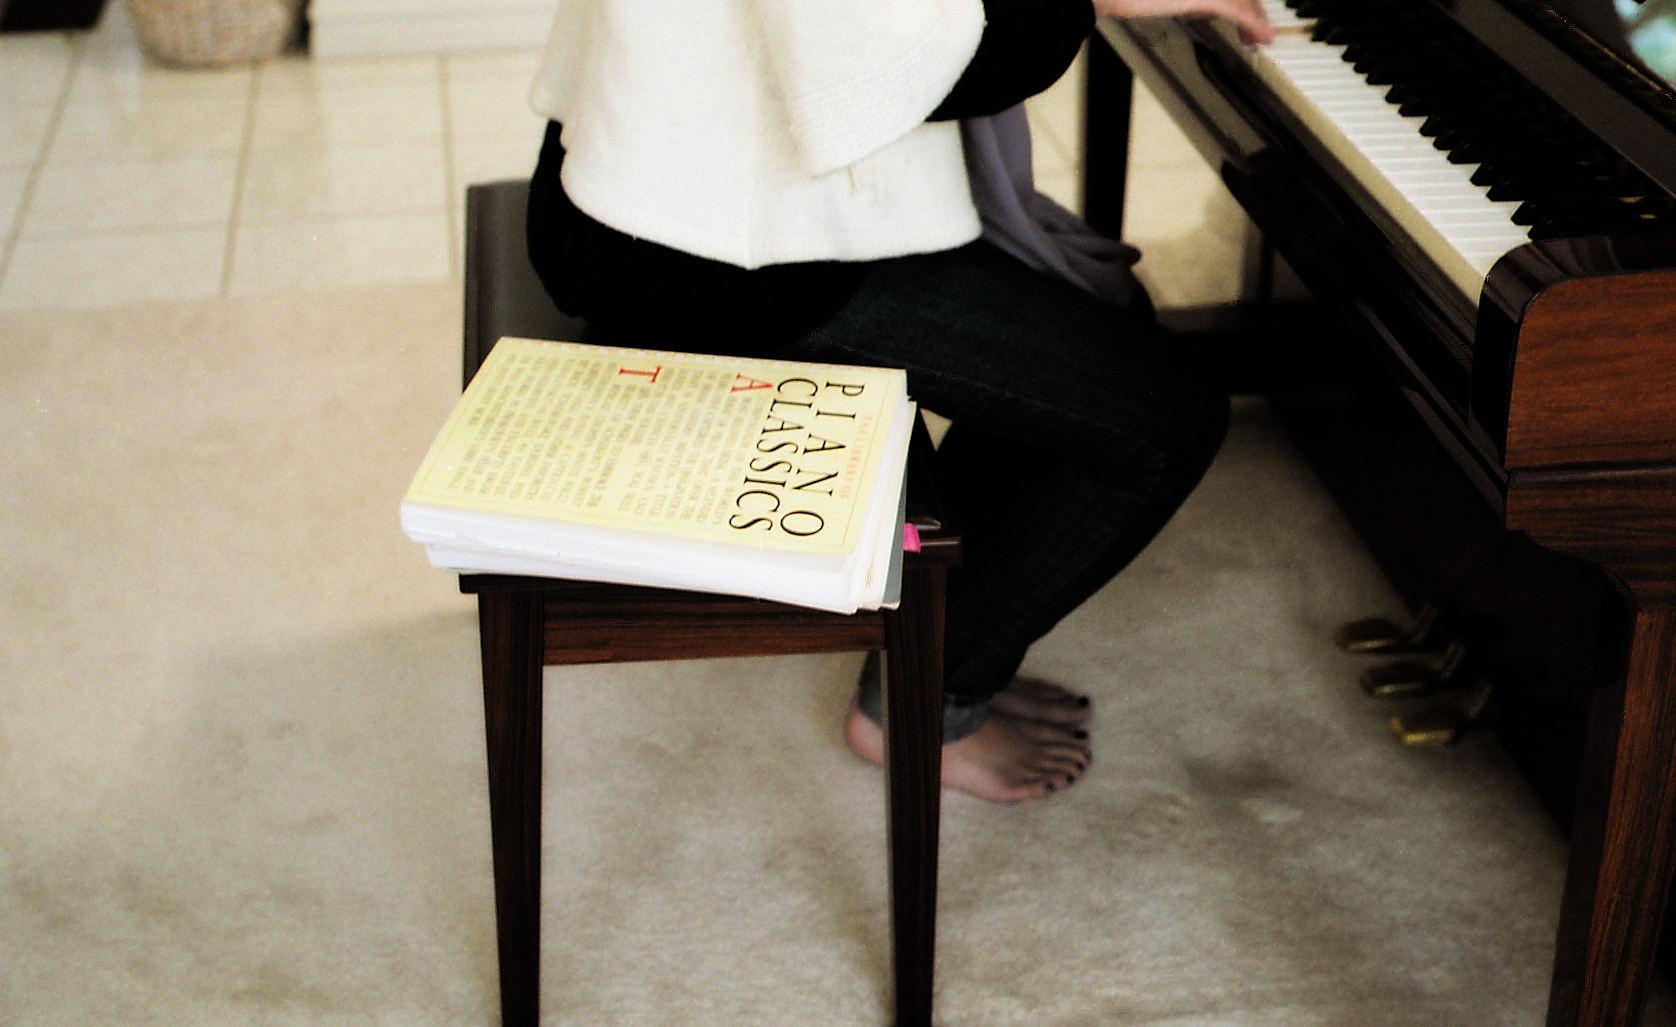 136/365: Practicing